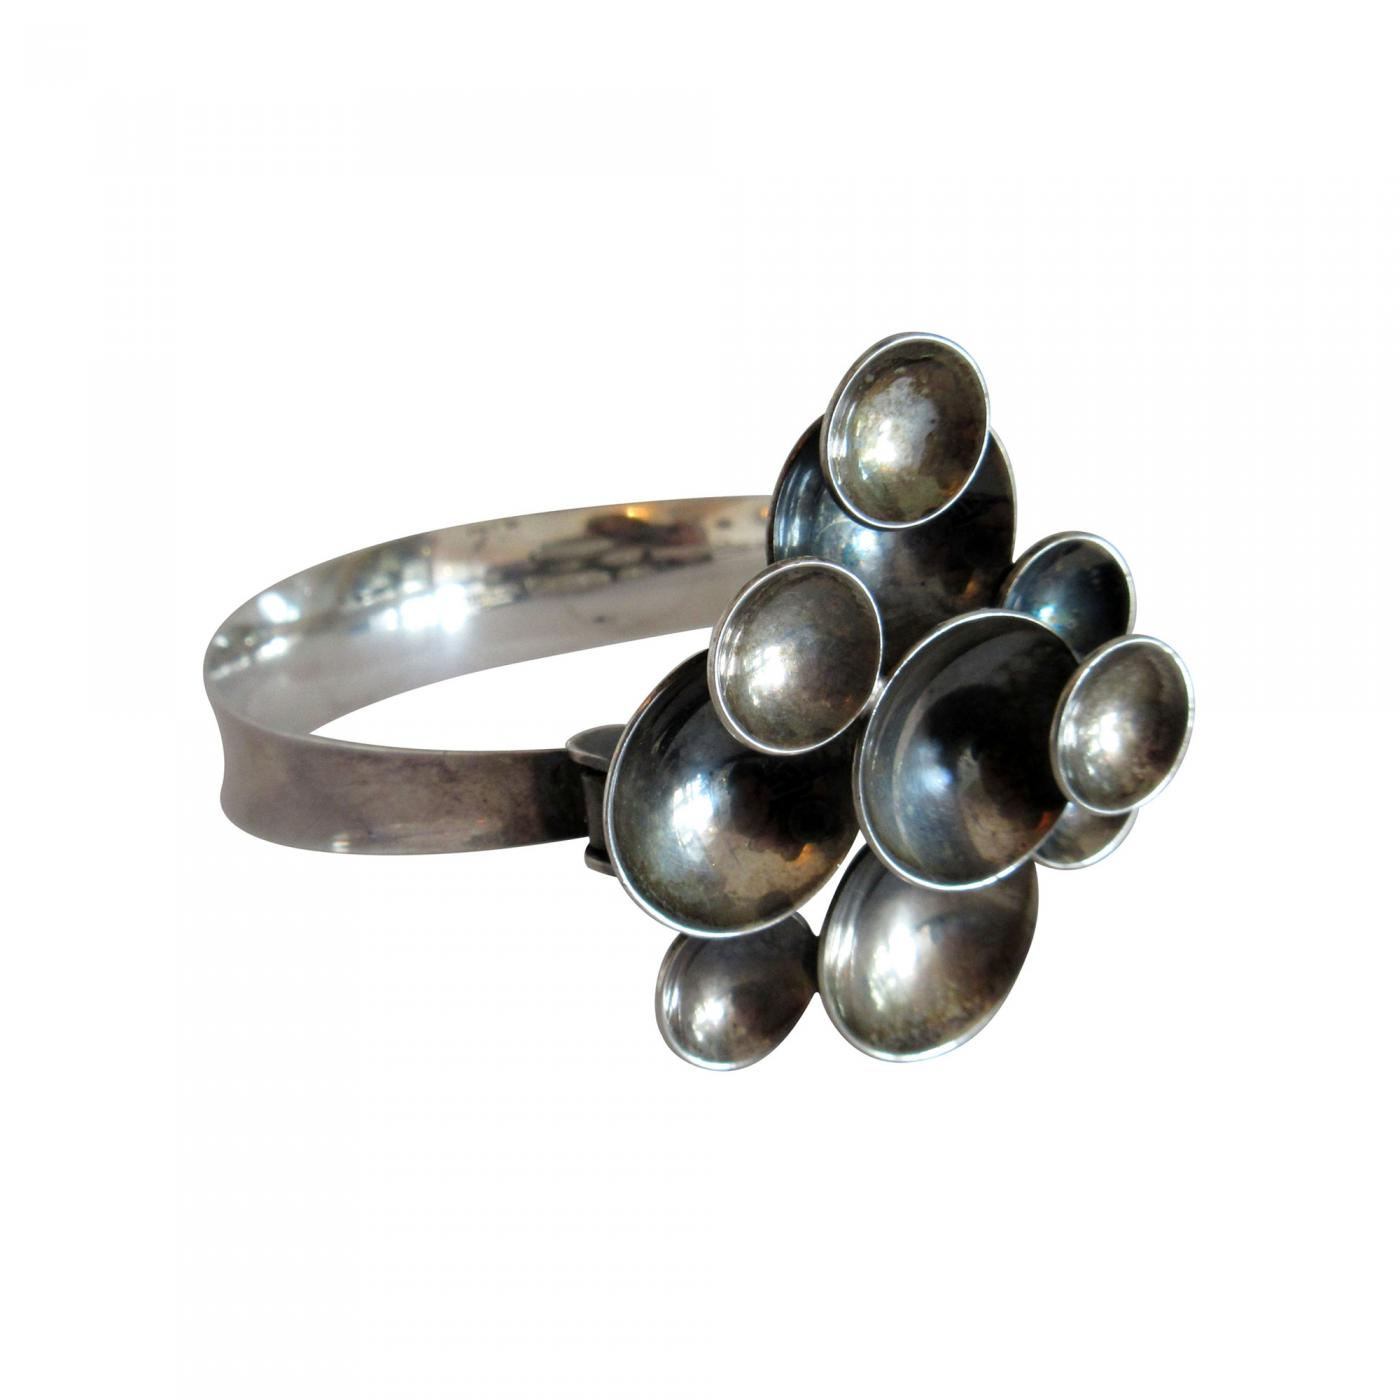 Vintage Kupittaan Kulta Finland Sterling Silver Bracelet